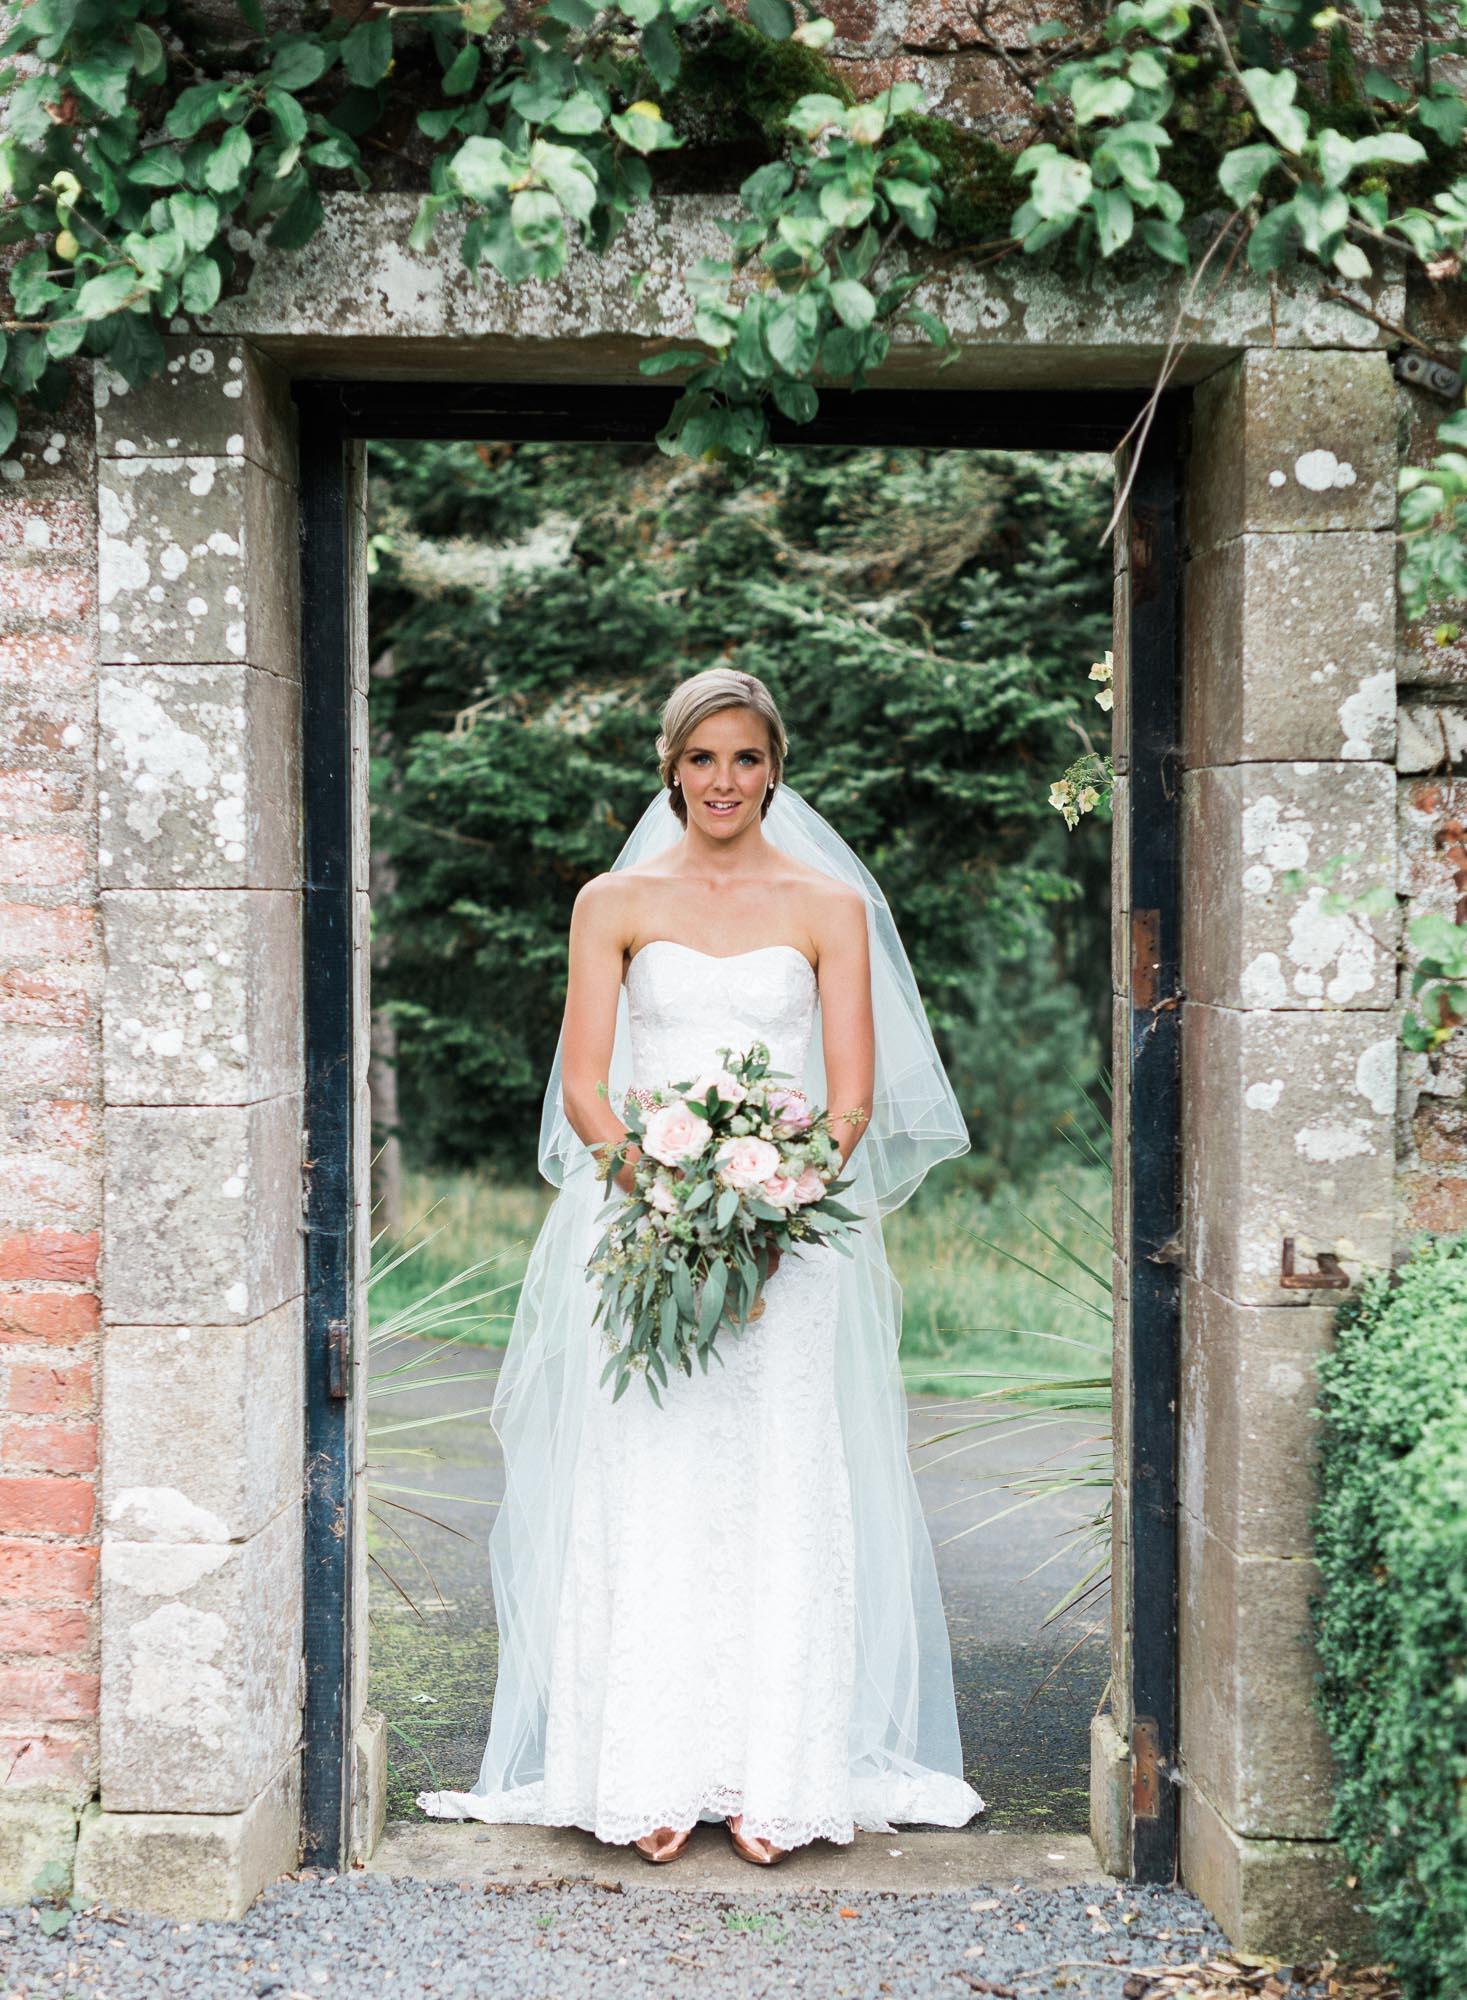 scottish_wedding_blairquhan_castle-38.jpg